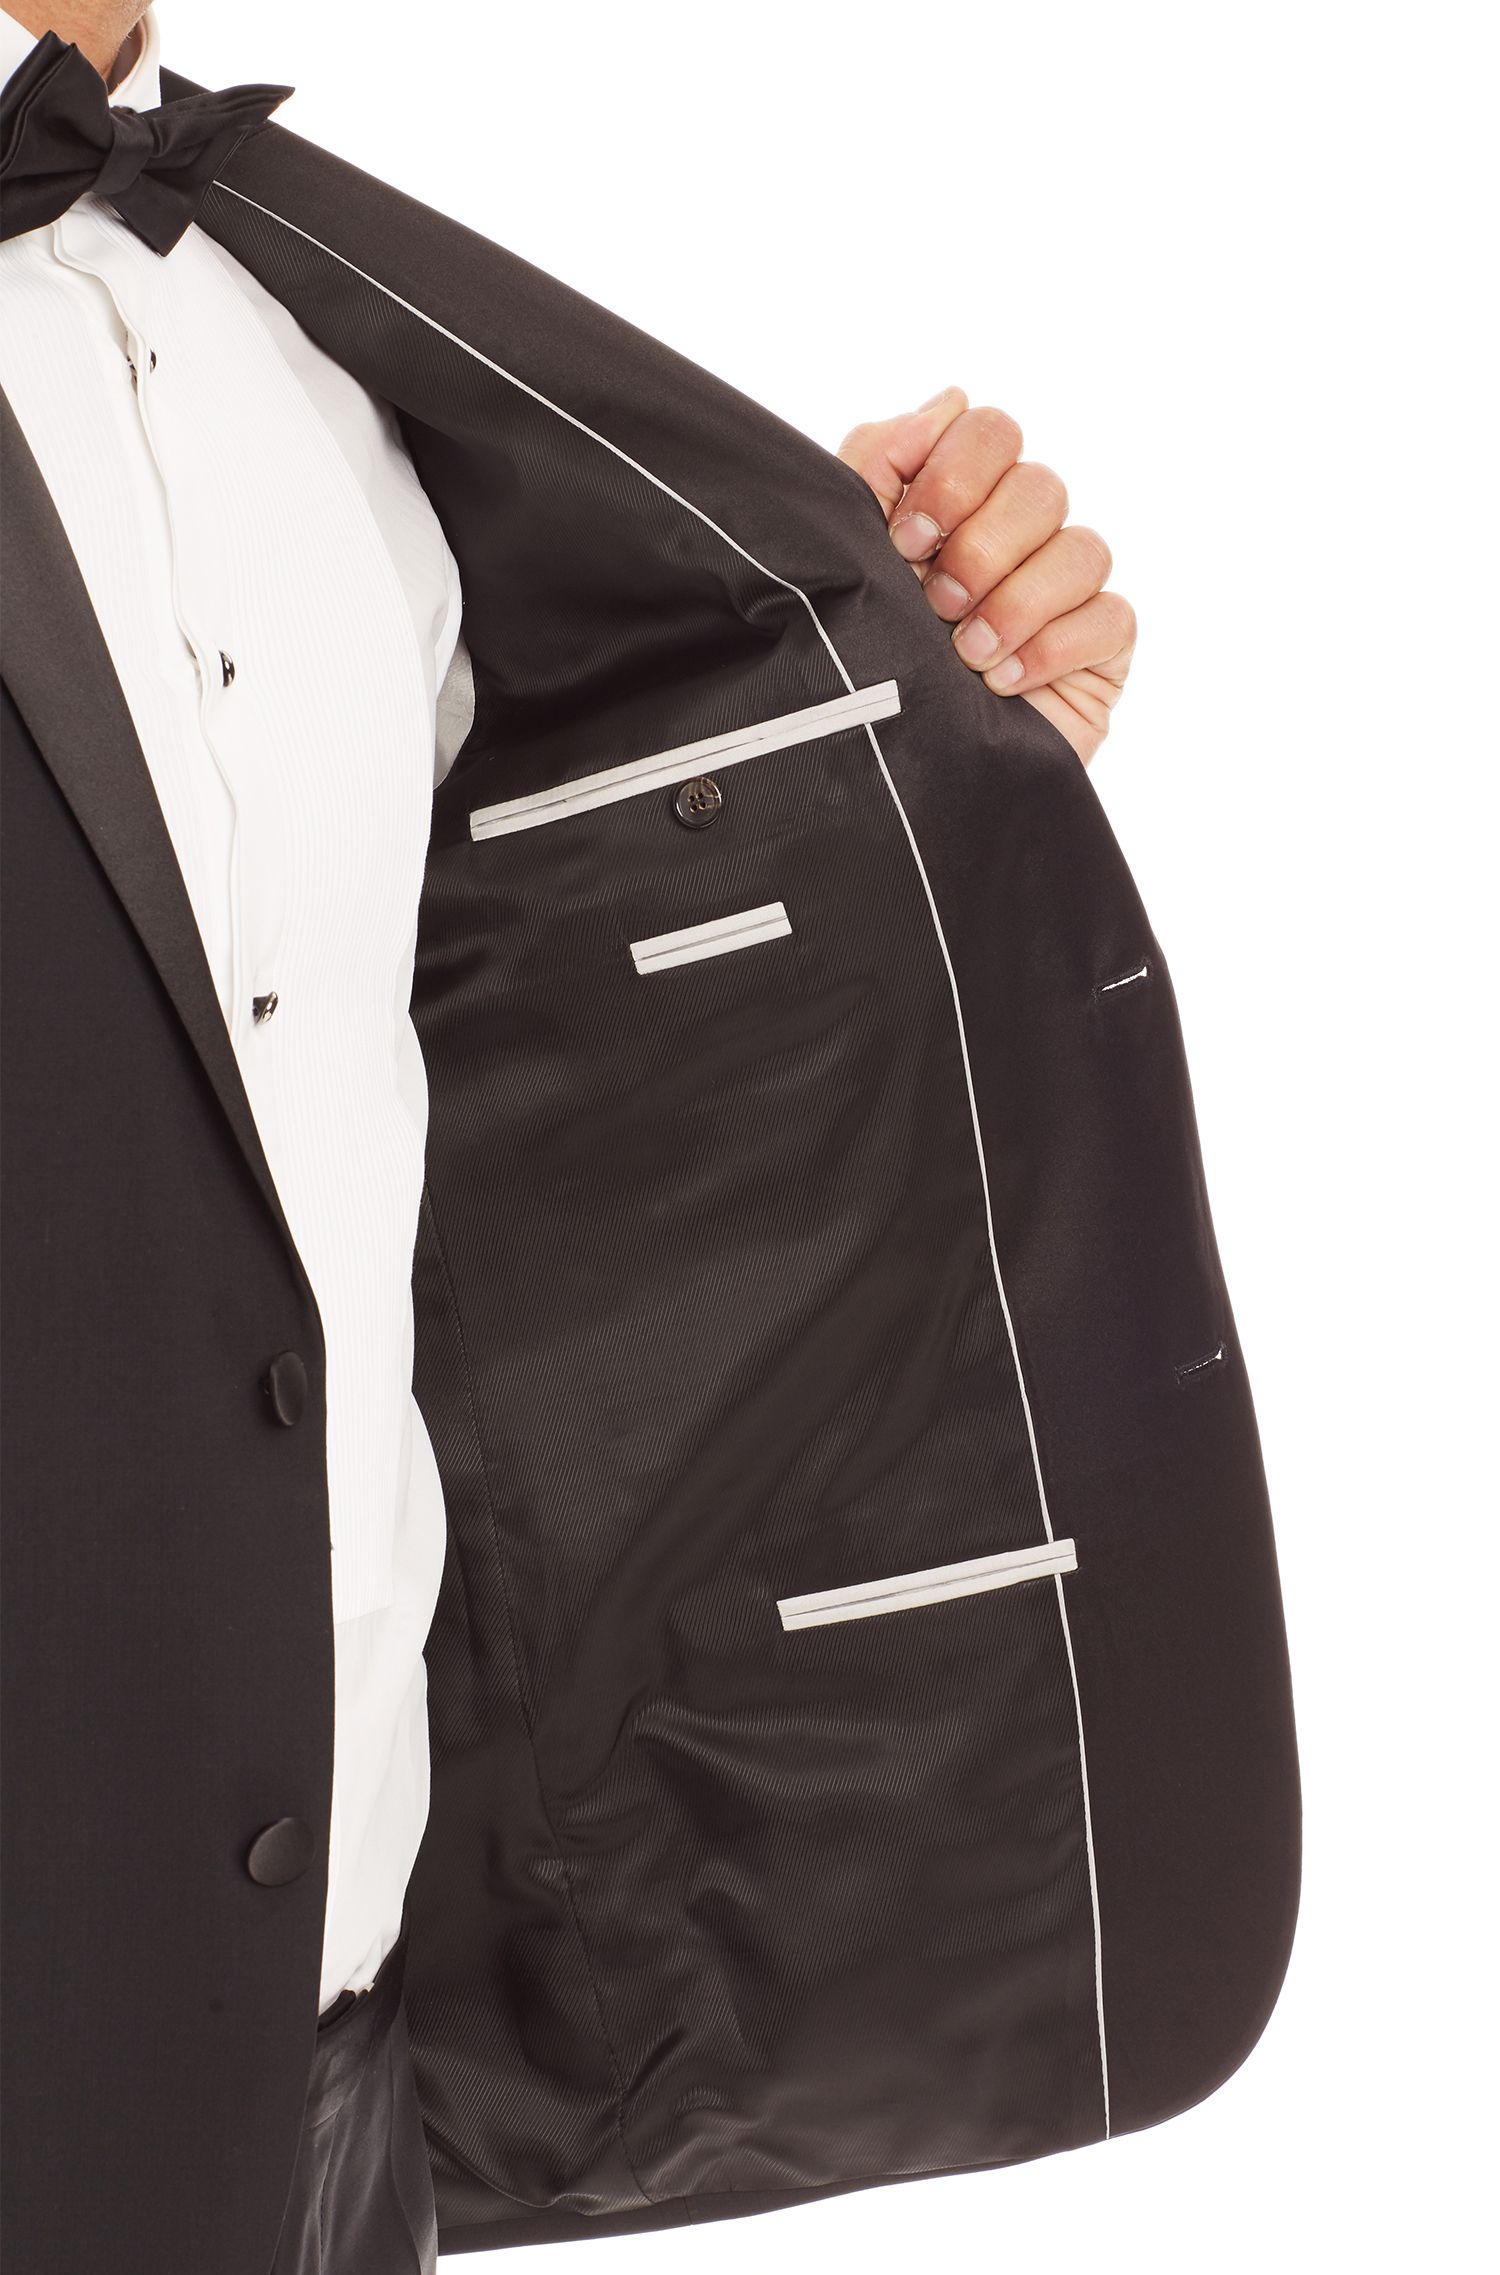 'Stars/Glamour ' | Regular Fit, Virgin Wool Notched Lapel Tuxedo